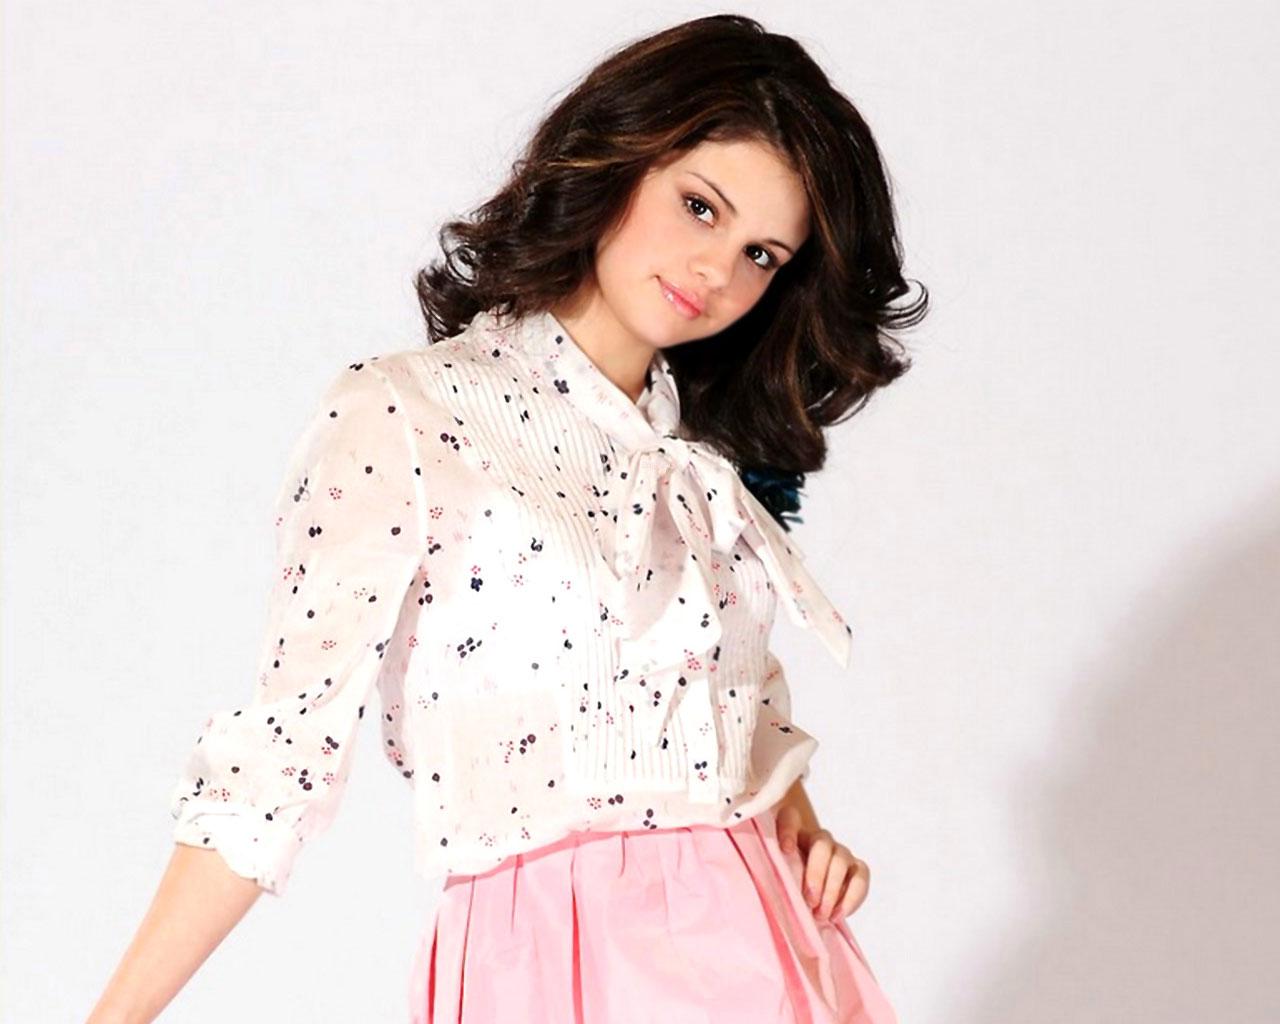 Sexy Selena Gomez wallpaper 02